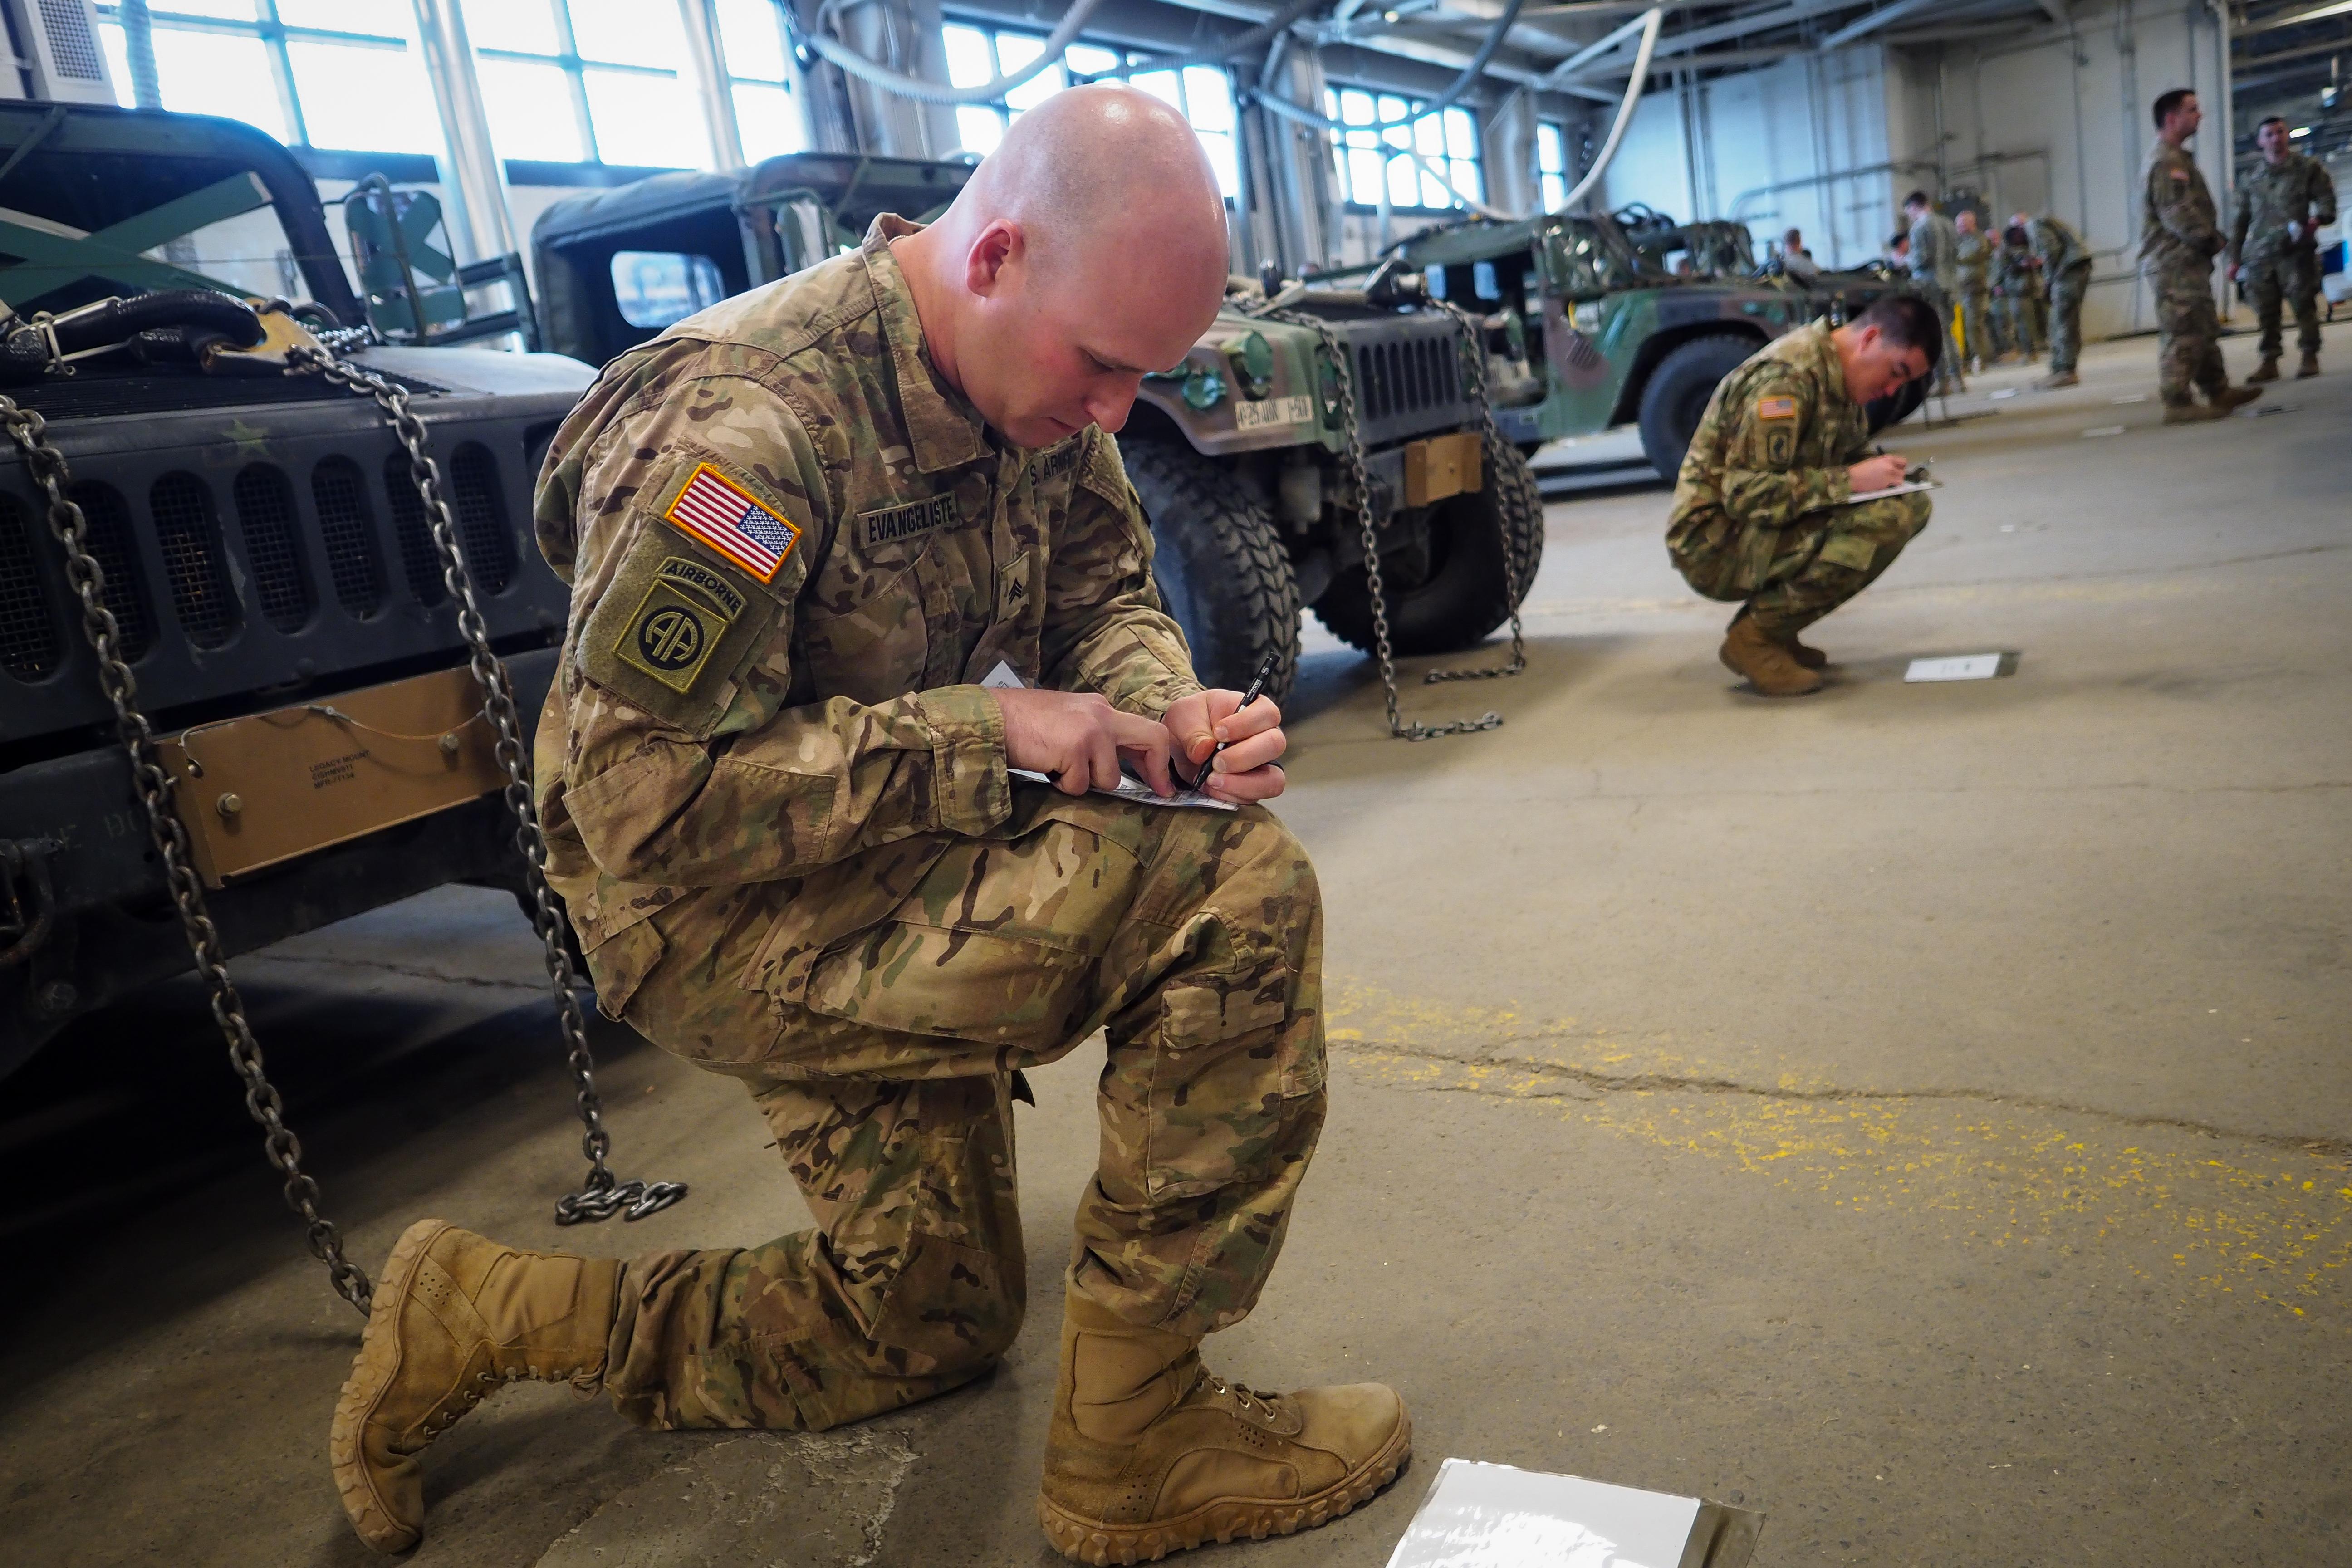 file alaska soldiers train as u s army pathfinders 160518 f lx370 rh commons wikimedia org U.S. Army Pathfinder Units Army Pathfinder Training